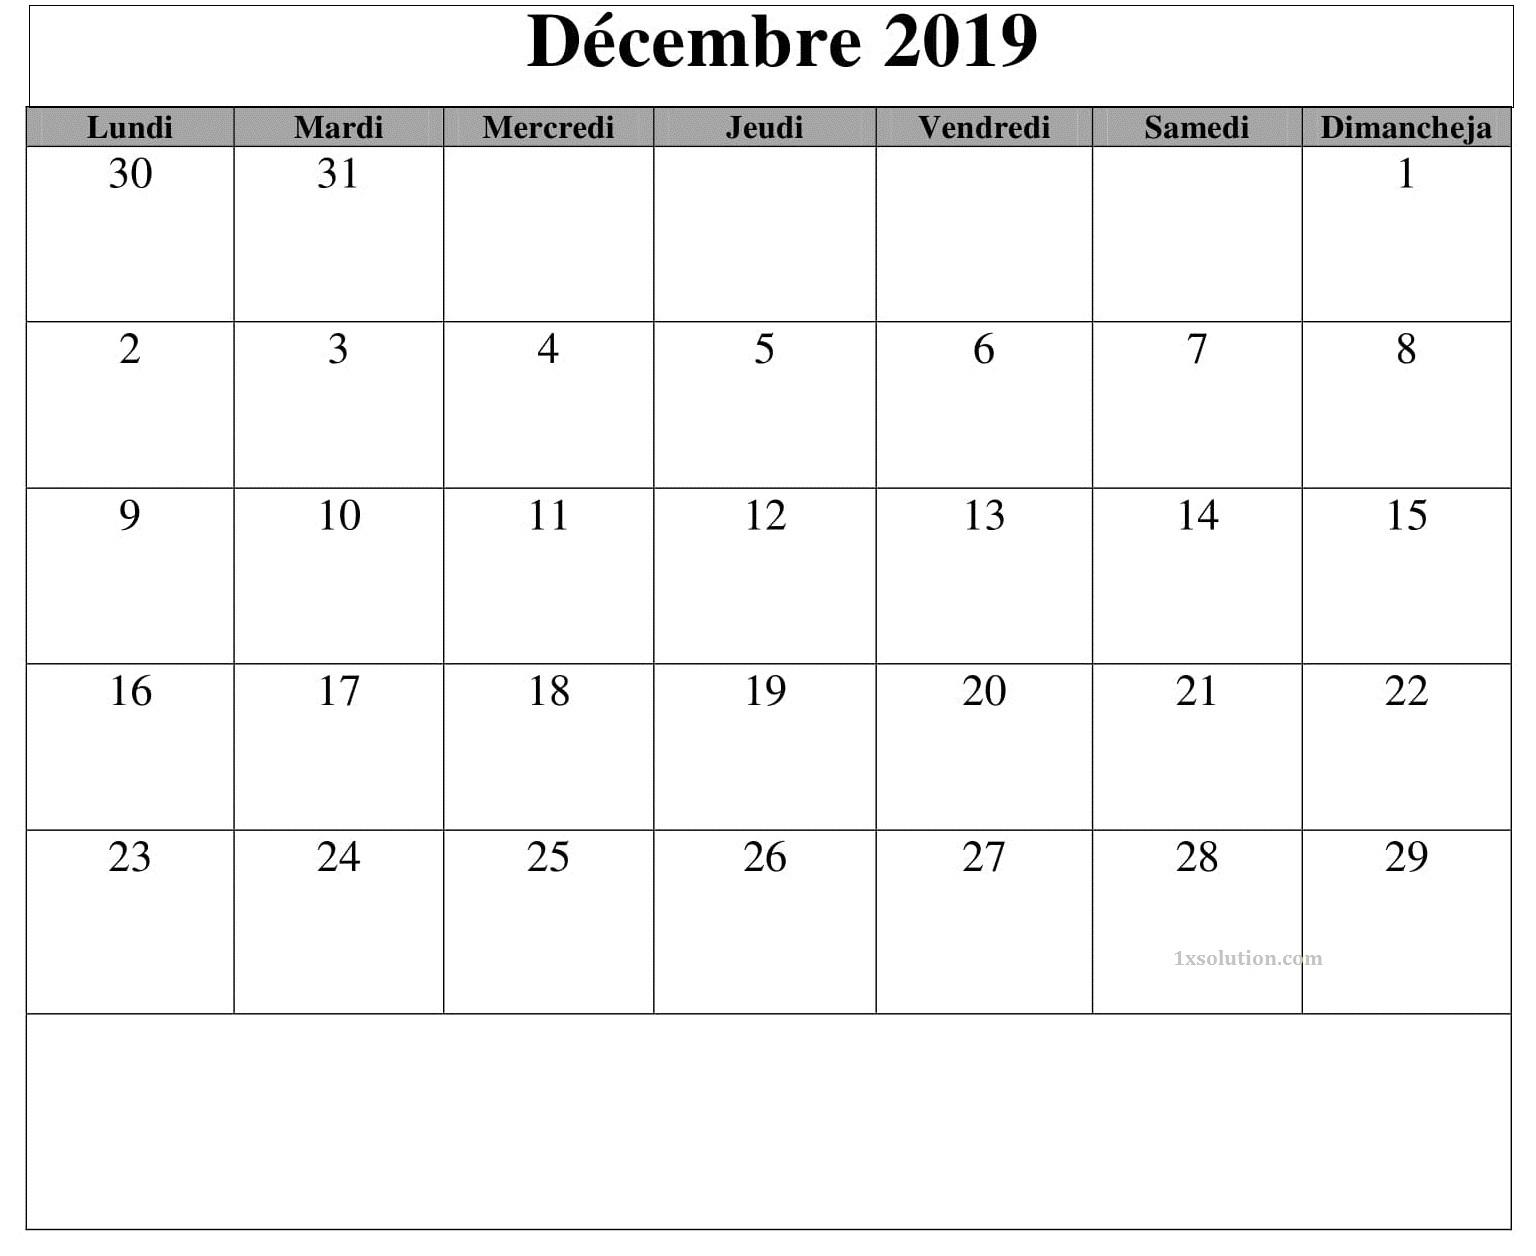 Calendrier Mensuel Decembre 2019.Calendrier Decembre 2019 Mensuel